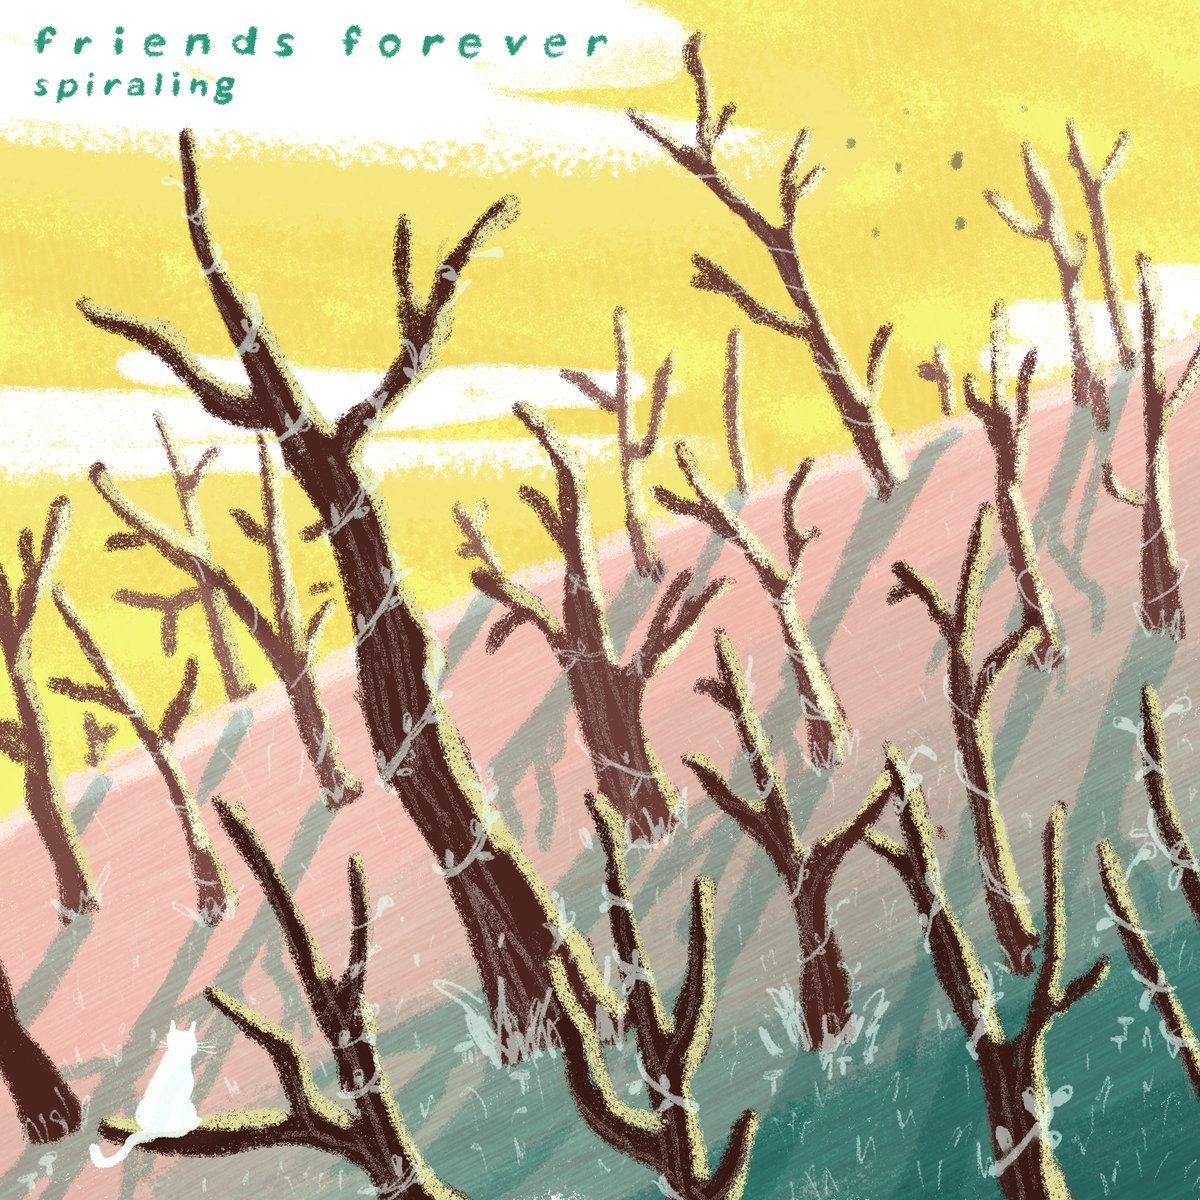 Spiraling- Friends Forever (2018)